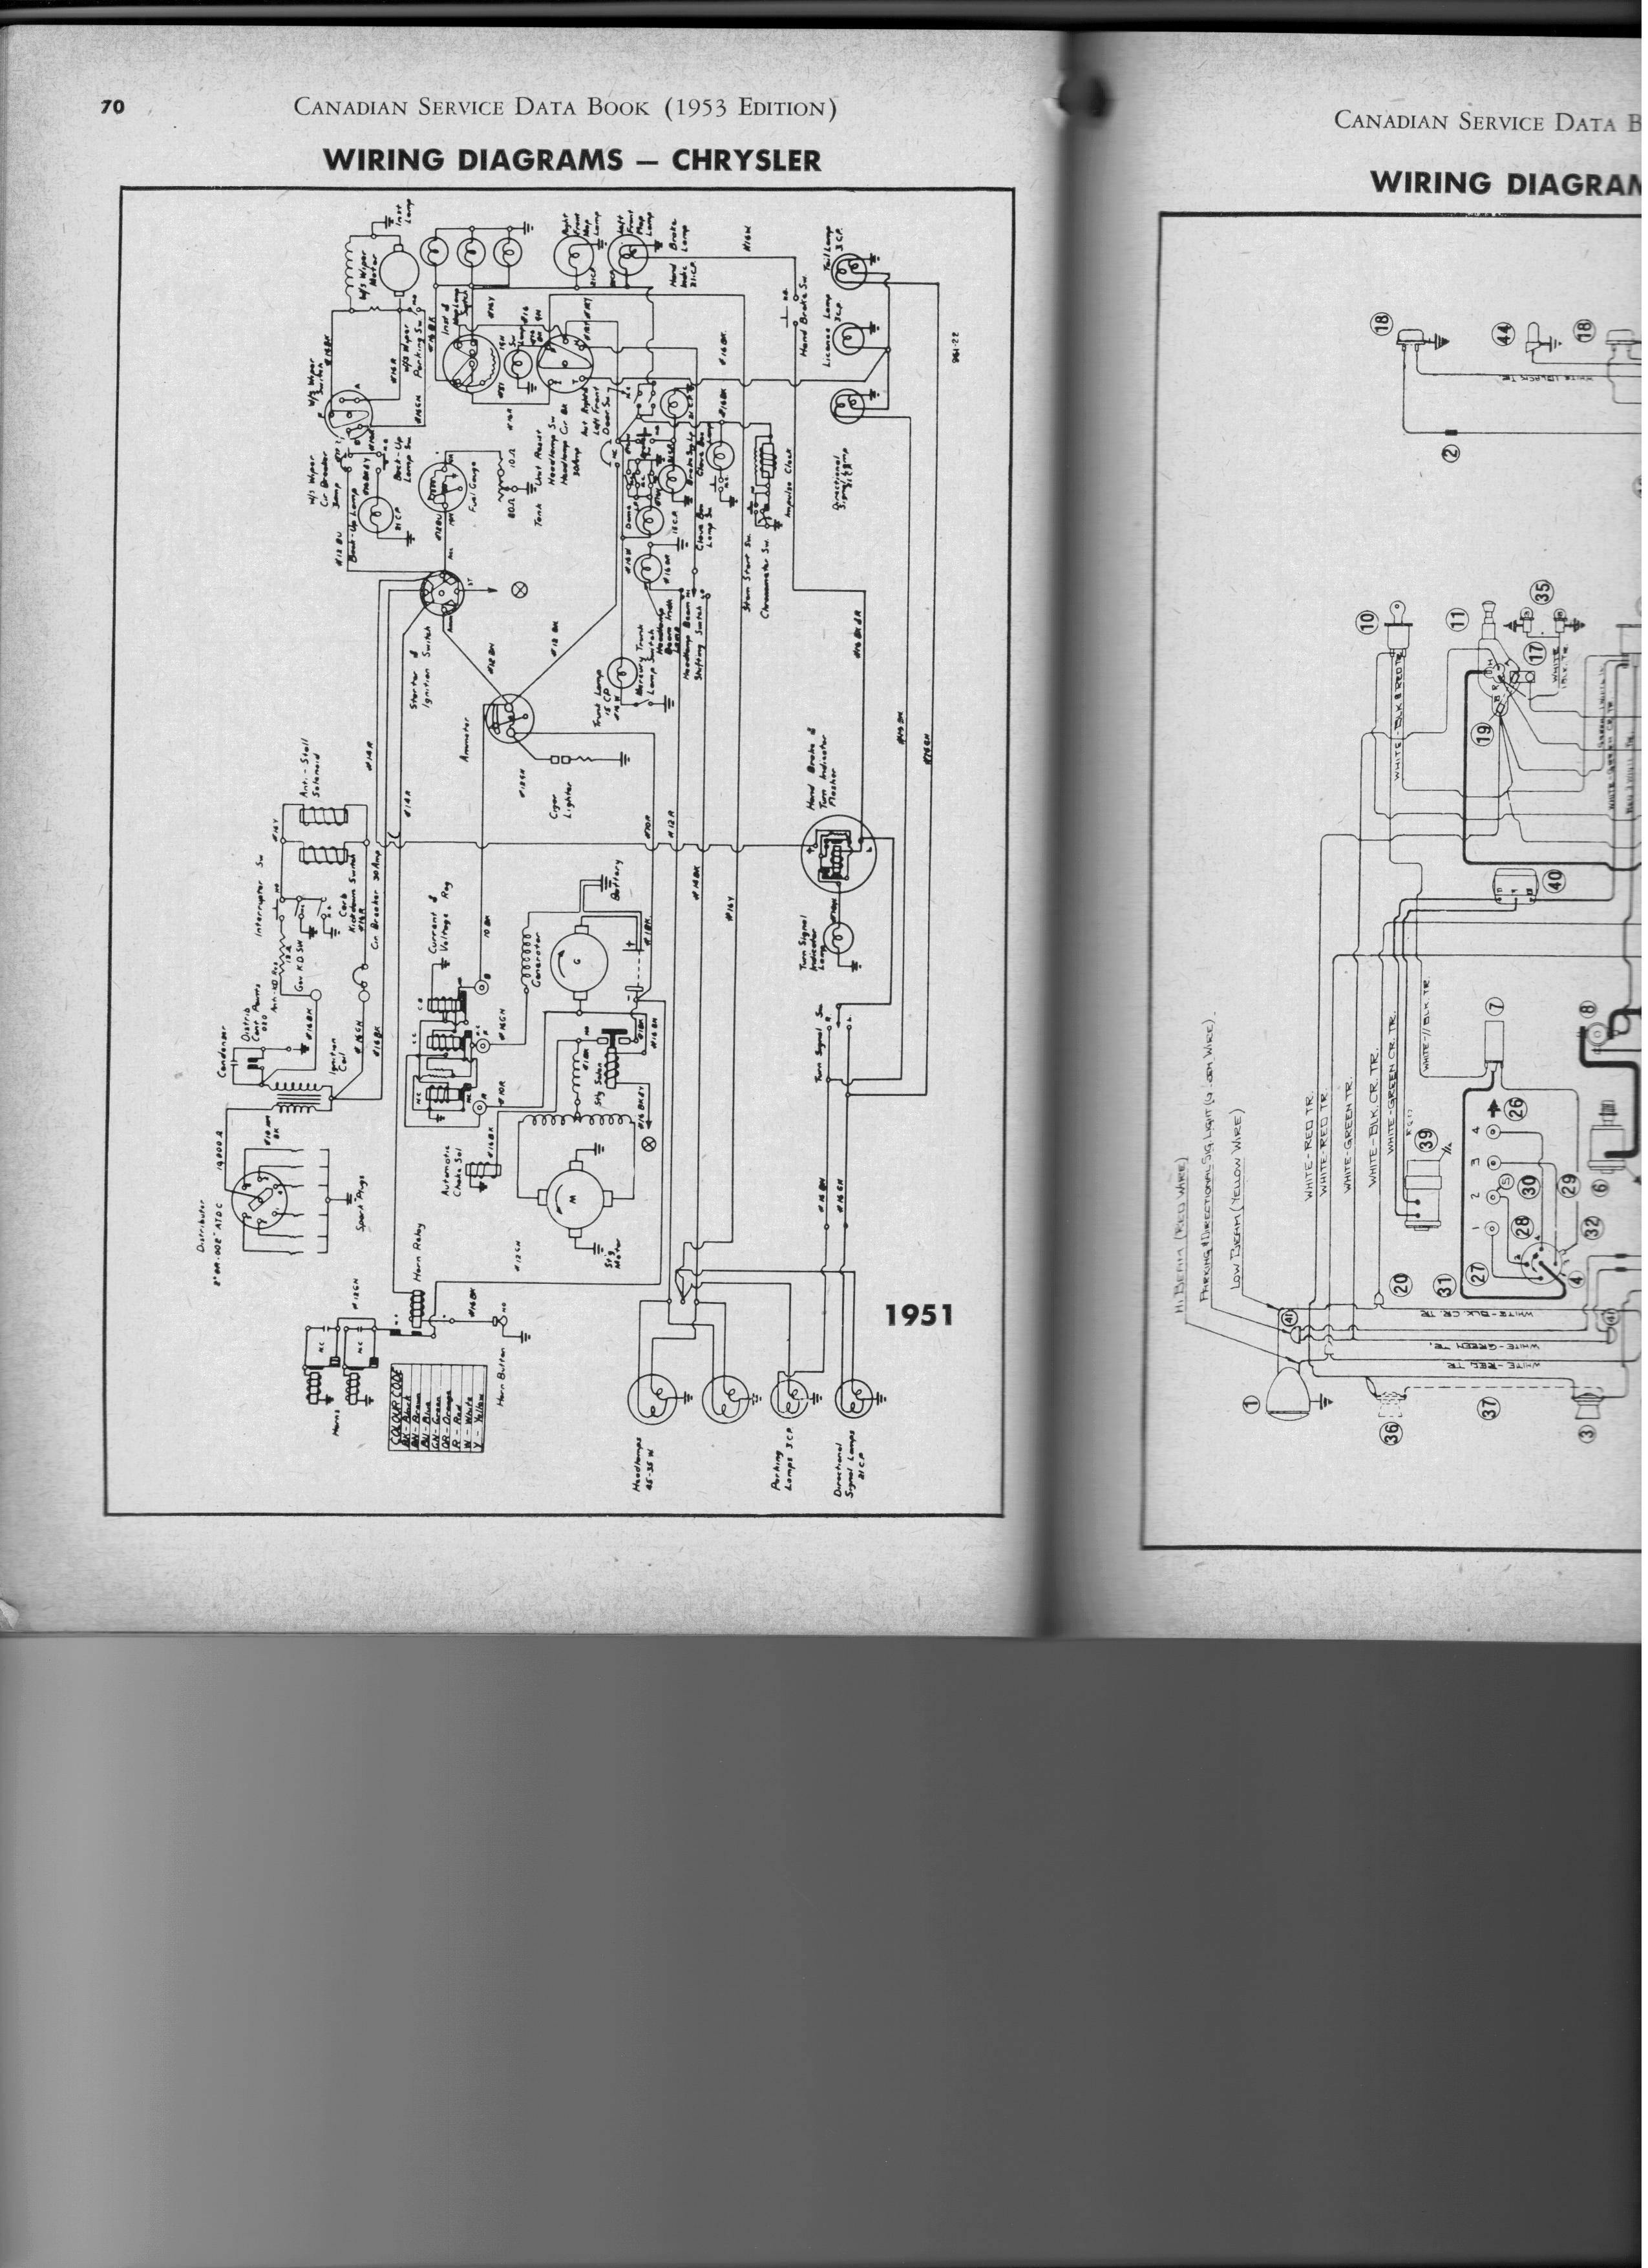 1949 chrysler wiring chart wire colors chrysler products general rh forums aaca org One Wire Alternator Diagram Schematics Basic Wiring Schematics